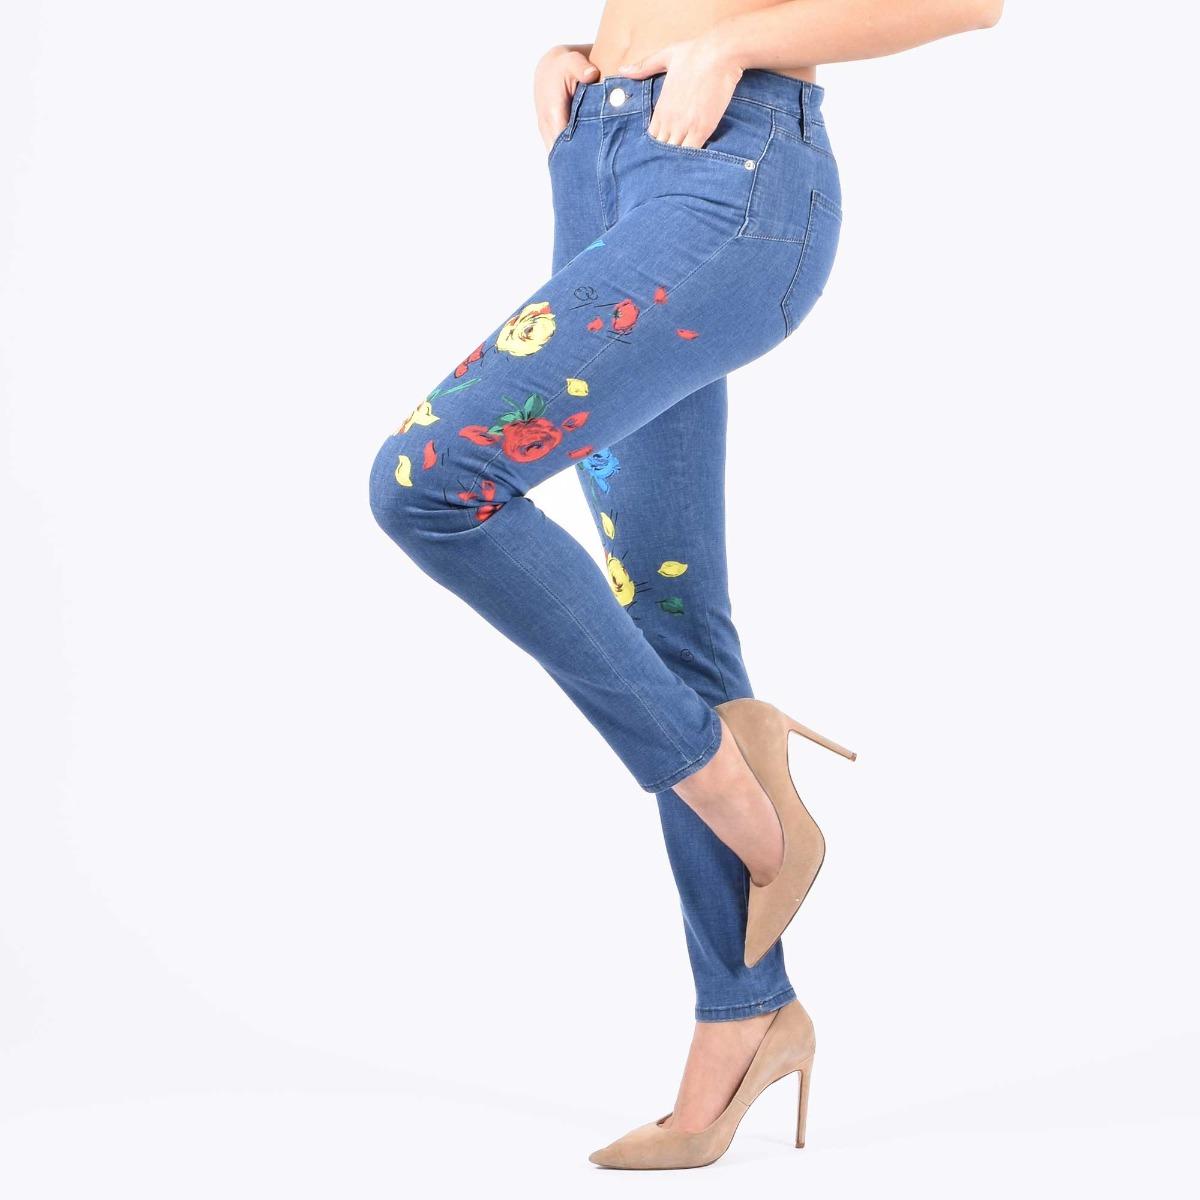 Jeans stampa floreale- Denim medio